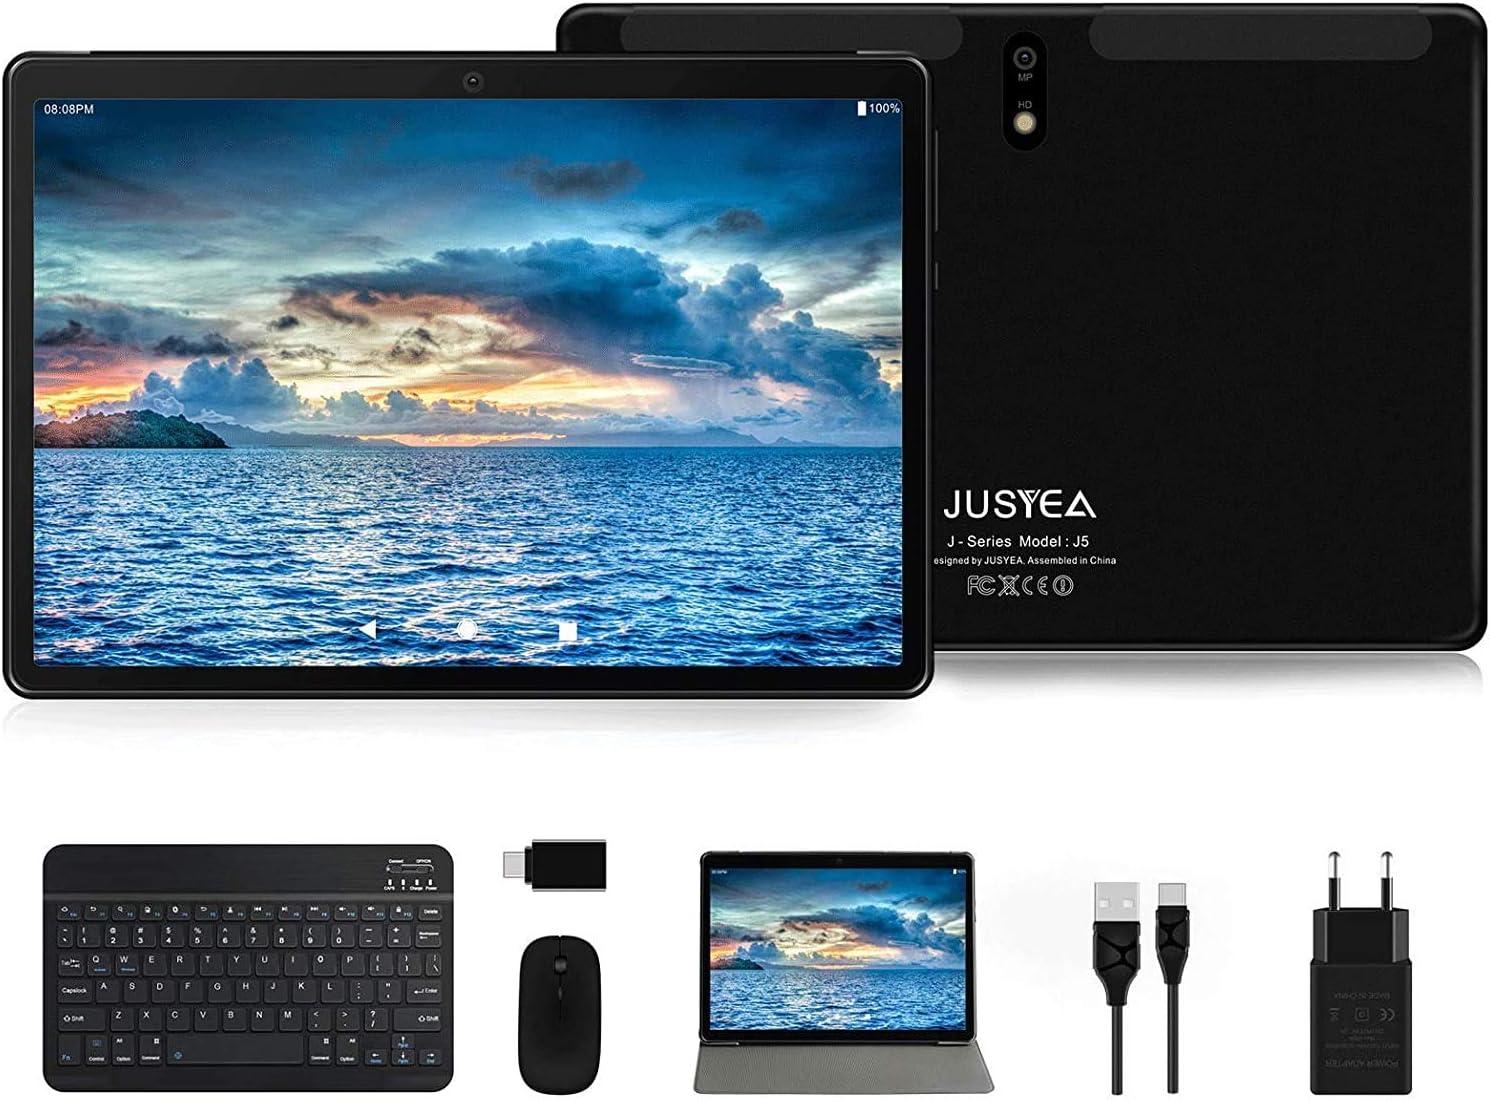 Tablet 10 Pulgadas Android 10.0 Tableta Ultra-Portátiles - RAM 4GB   64GB Expandible (Certificación Google GMS) -JUSYEA - Batería de 8000mAh - WiFi ...